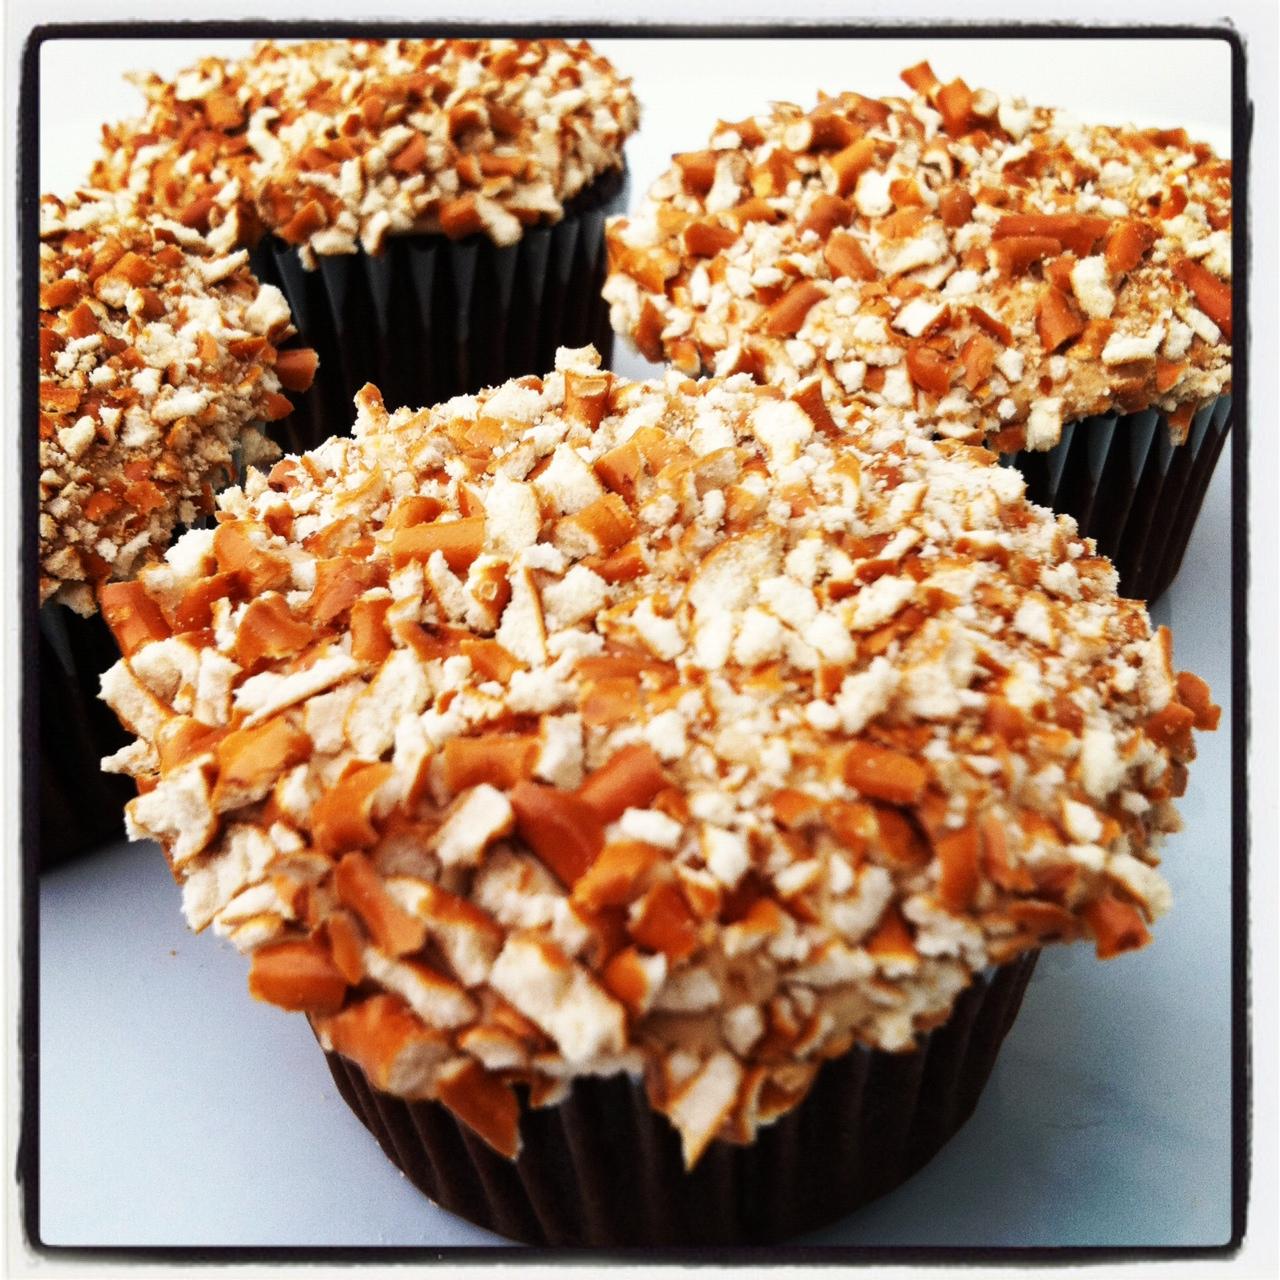 Peanut Butter Chocolate Pretzel Crunch Cupcakes